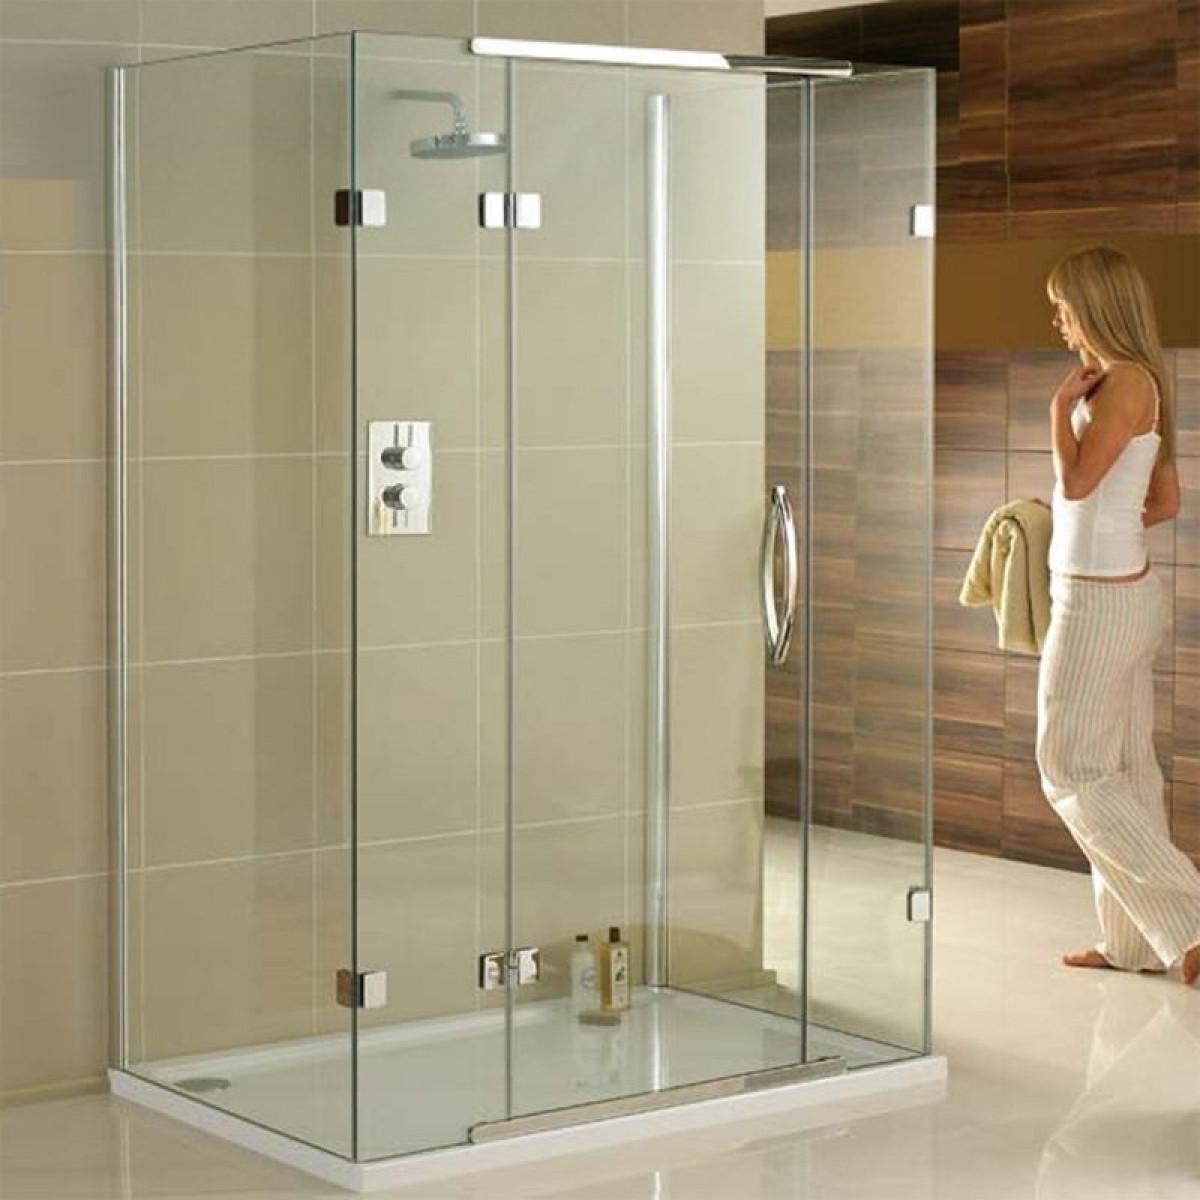 Aquadart 1600 X 800mm 3 Sided Shower Enclosure Aq1033